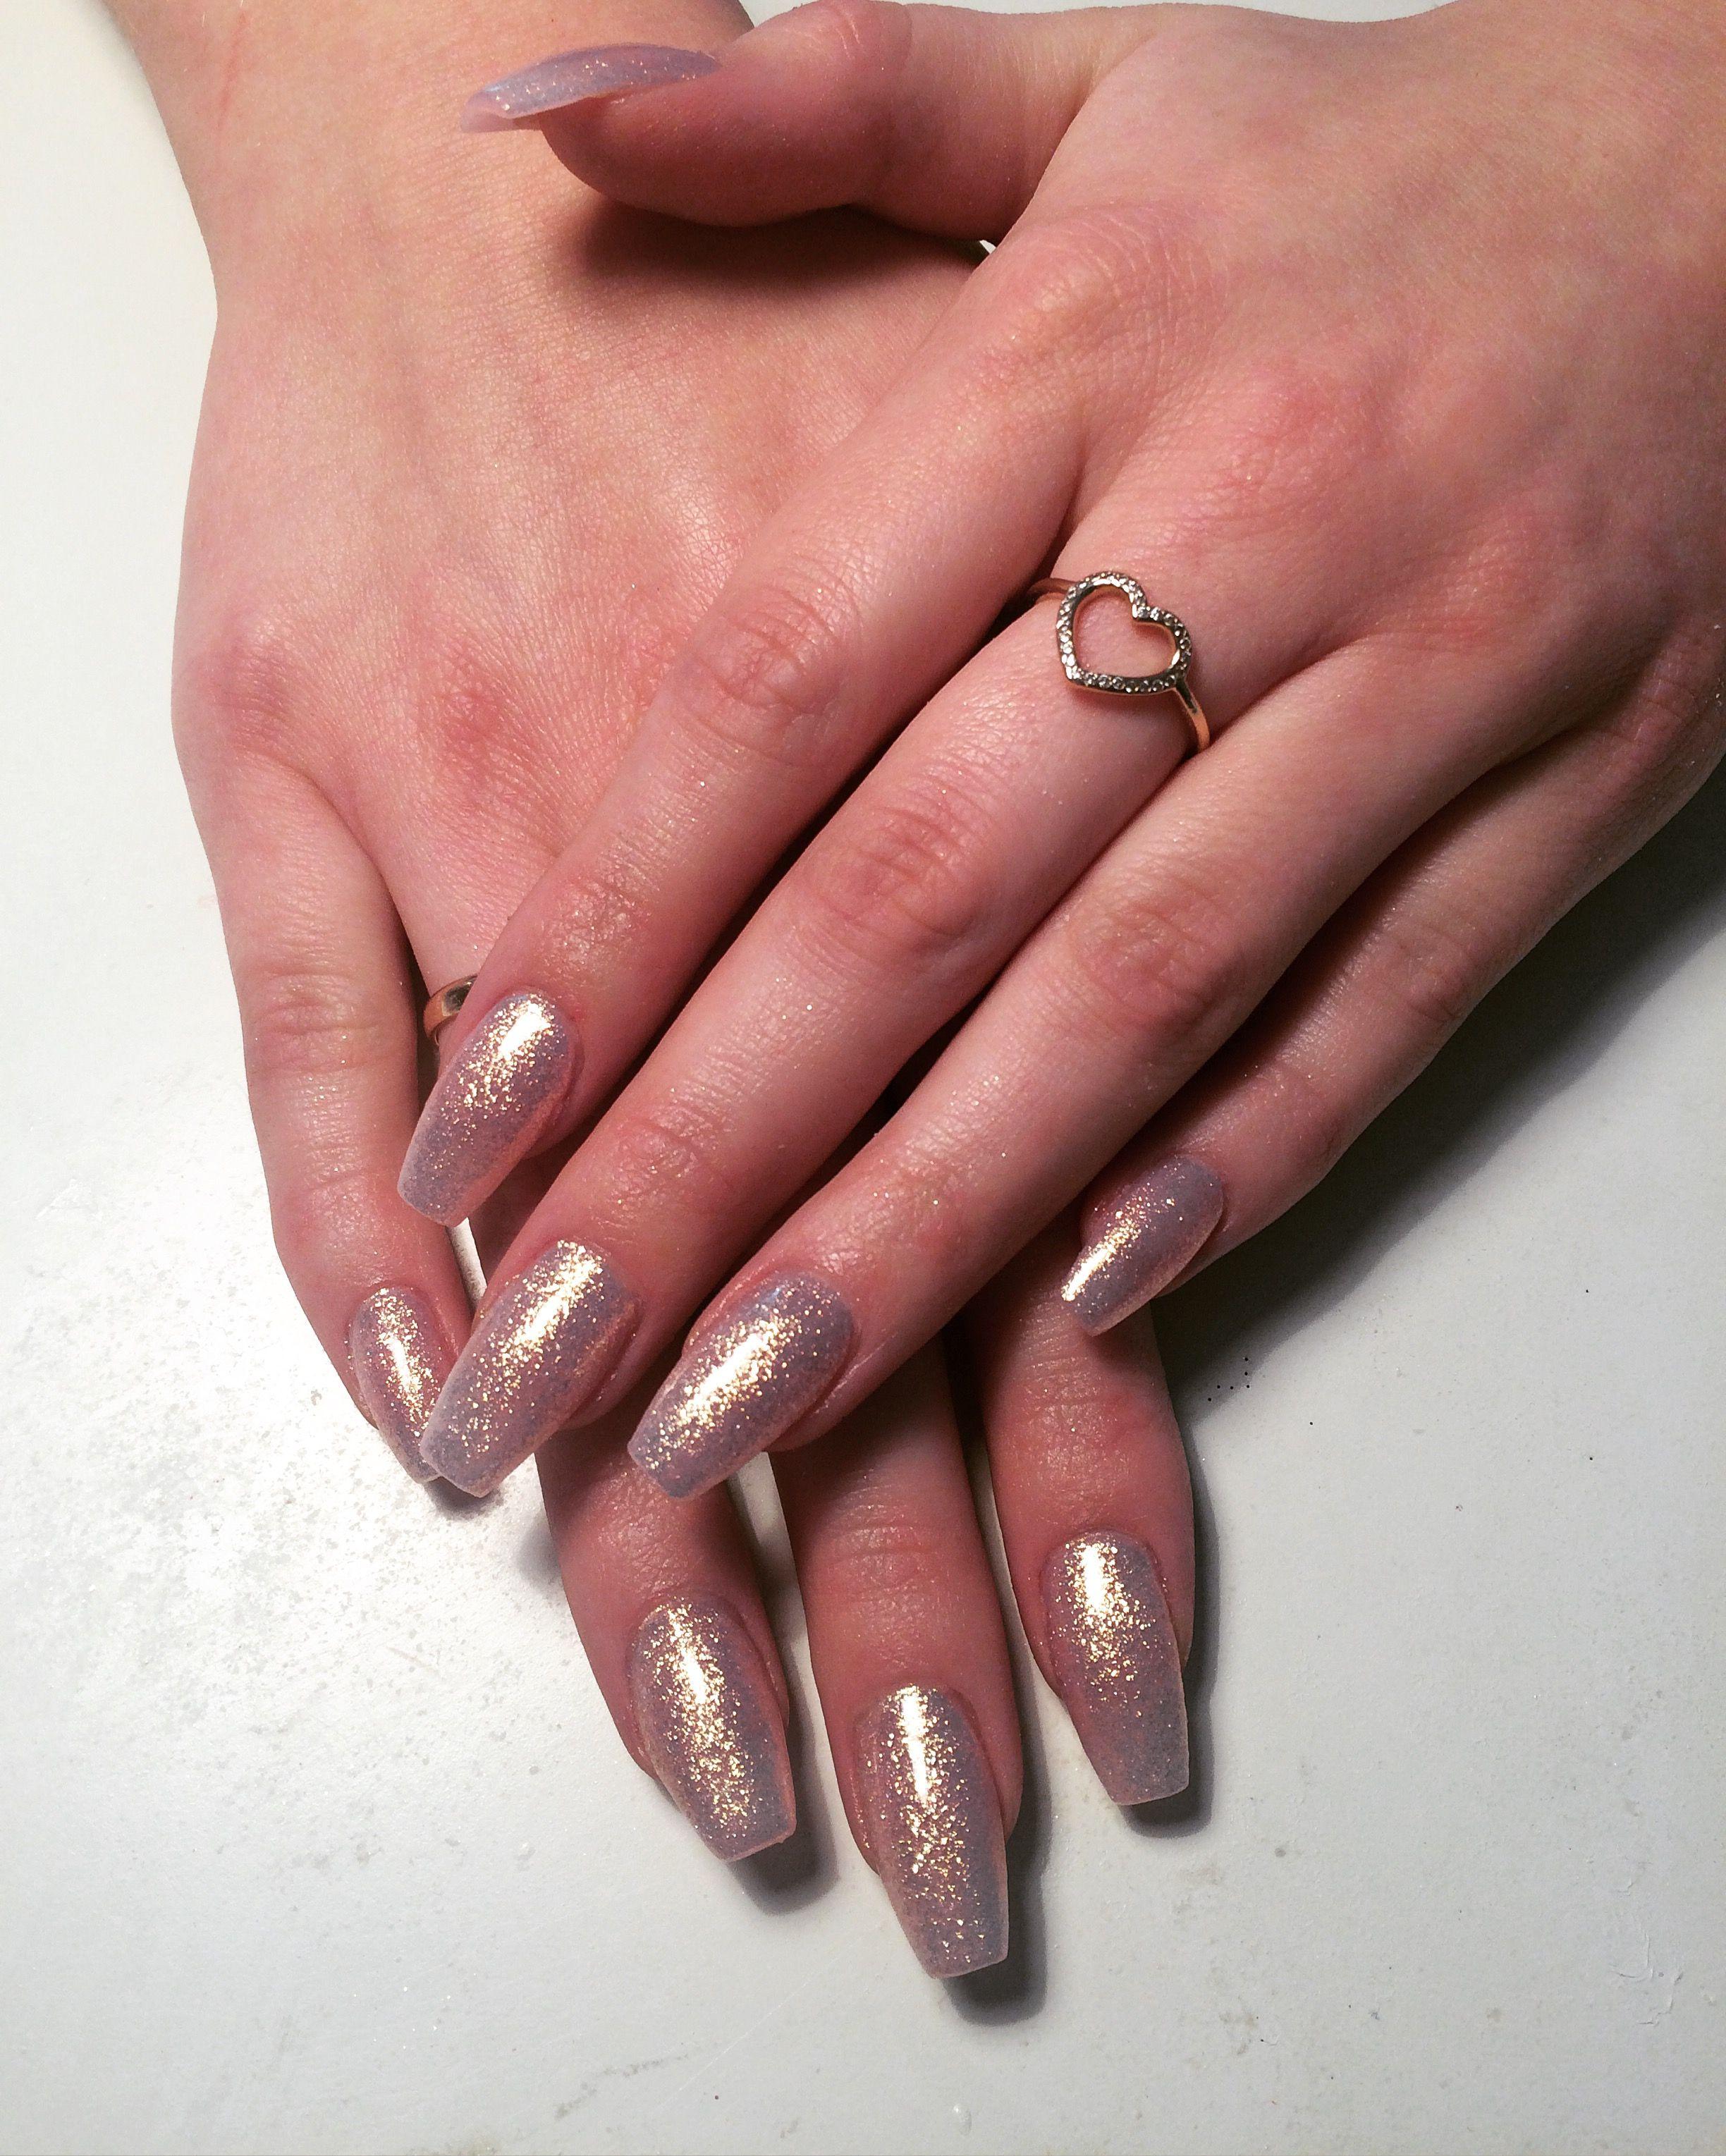 Fairy dust acrylic nails | beauty | Pinterest | Fun nails